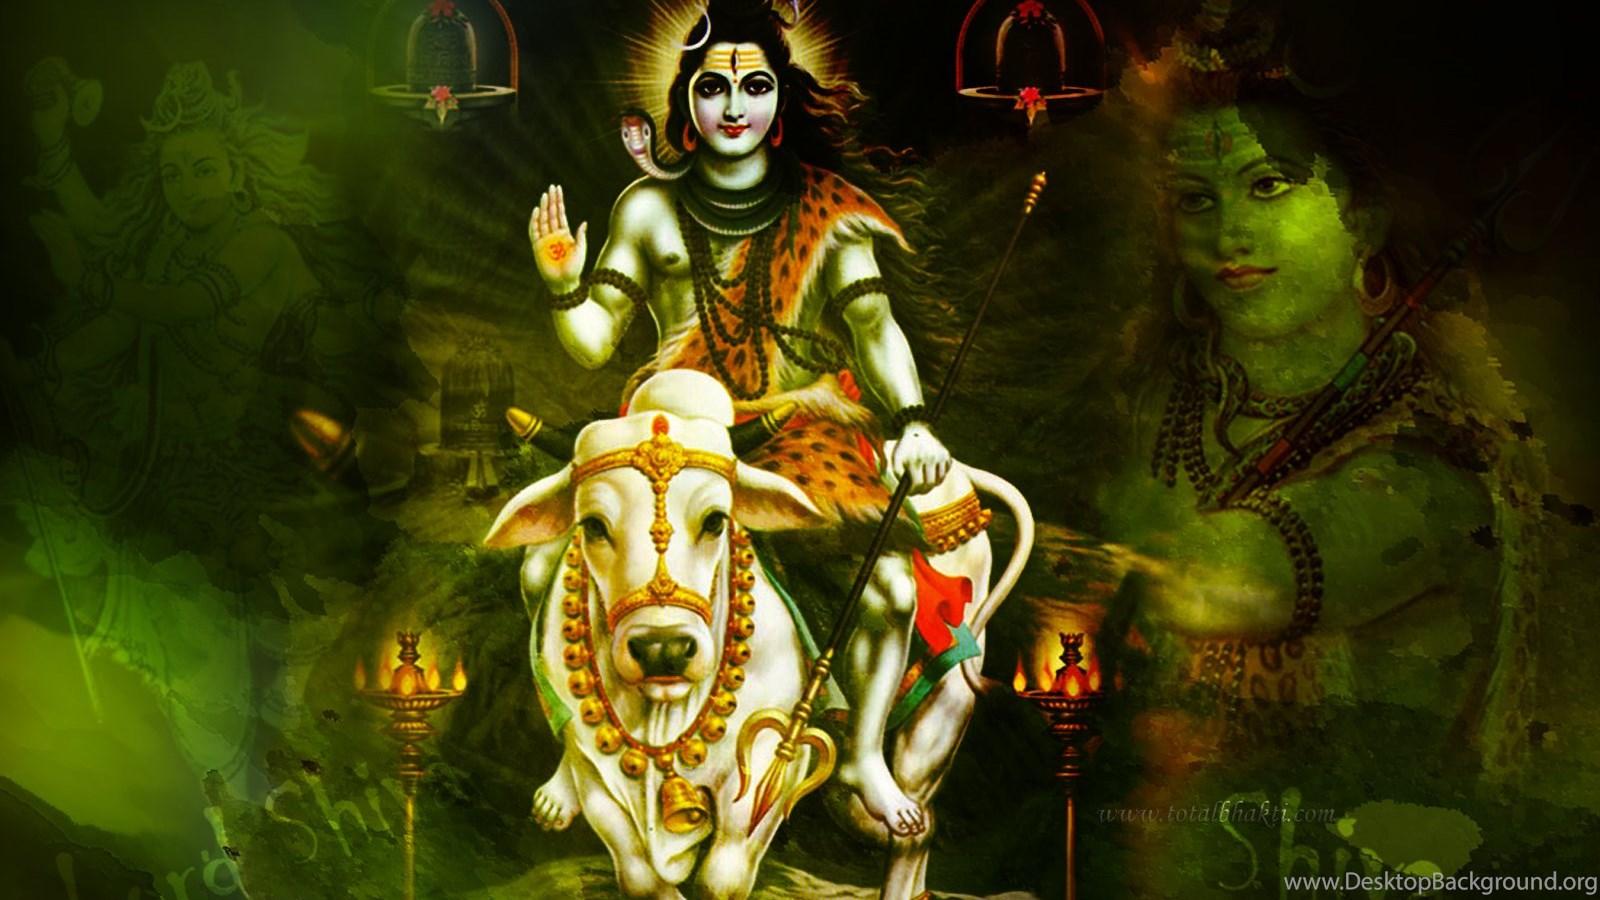 Most Inspiring Wallpaper Lord Desktop - 1001977_shiva-wallpaper-hindu-wallpaper-lord-shiva-wallpapers-green_1600x1024_h  Picture_626767.jpg